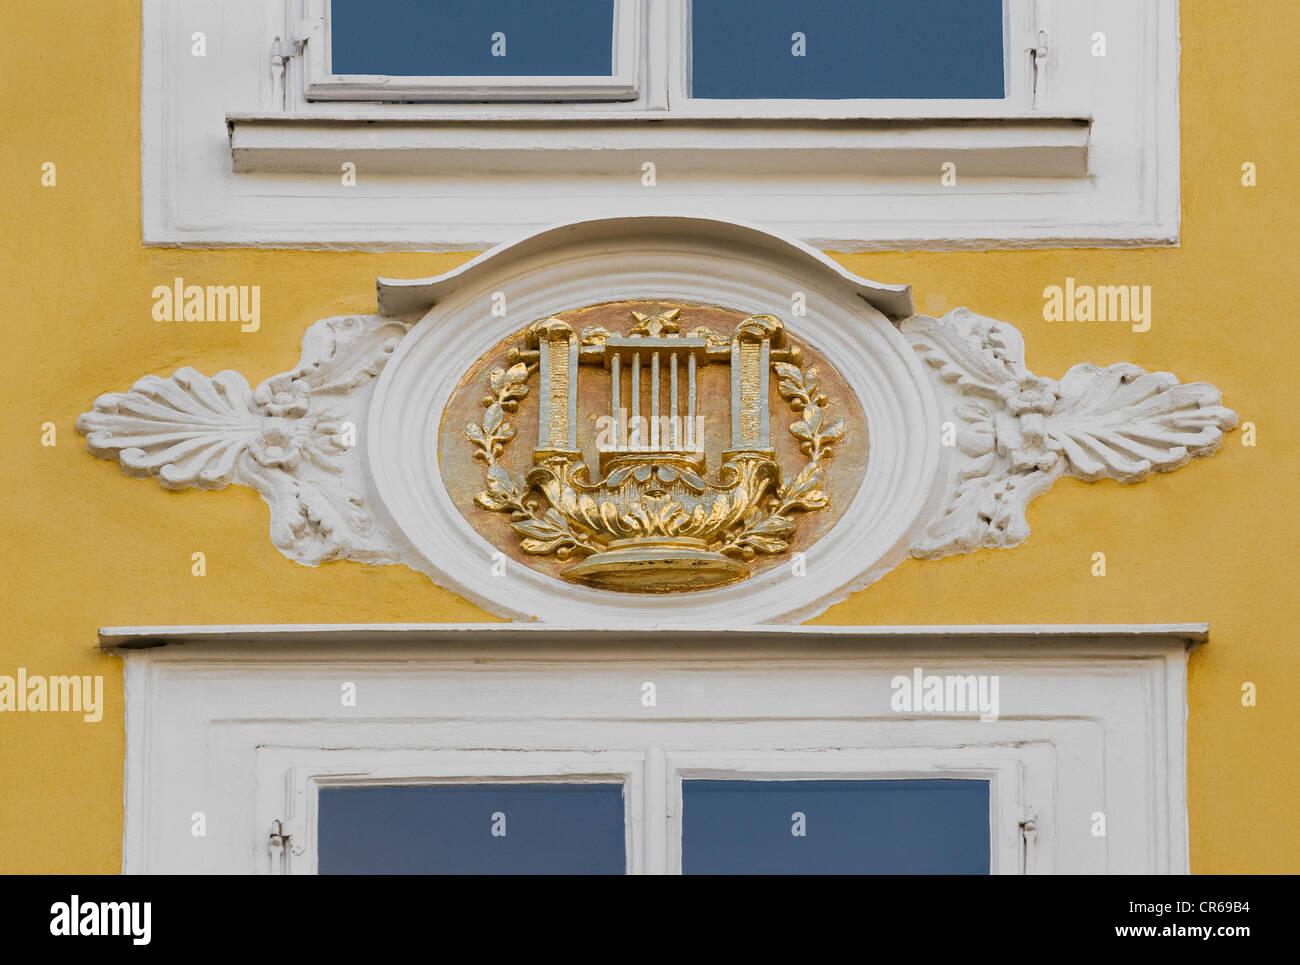 Stuck element with gold lyre on Mozart's birthplace, Getreidegasse, Salzburg, UNESCO World Heritage Site, Austria, - Stock Image